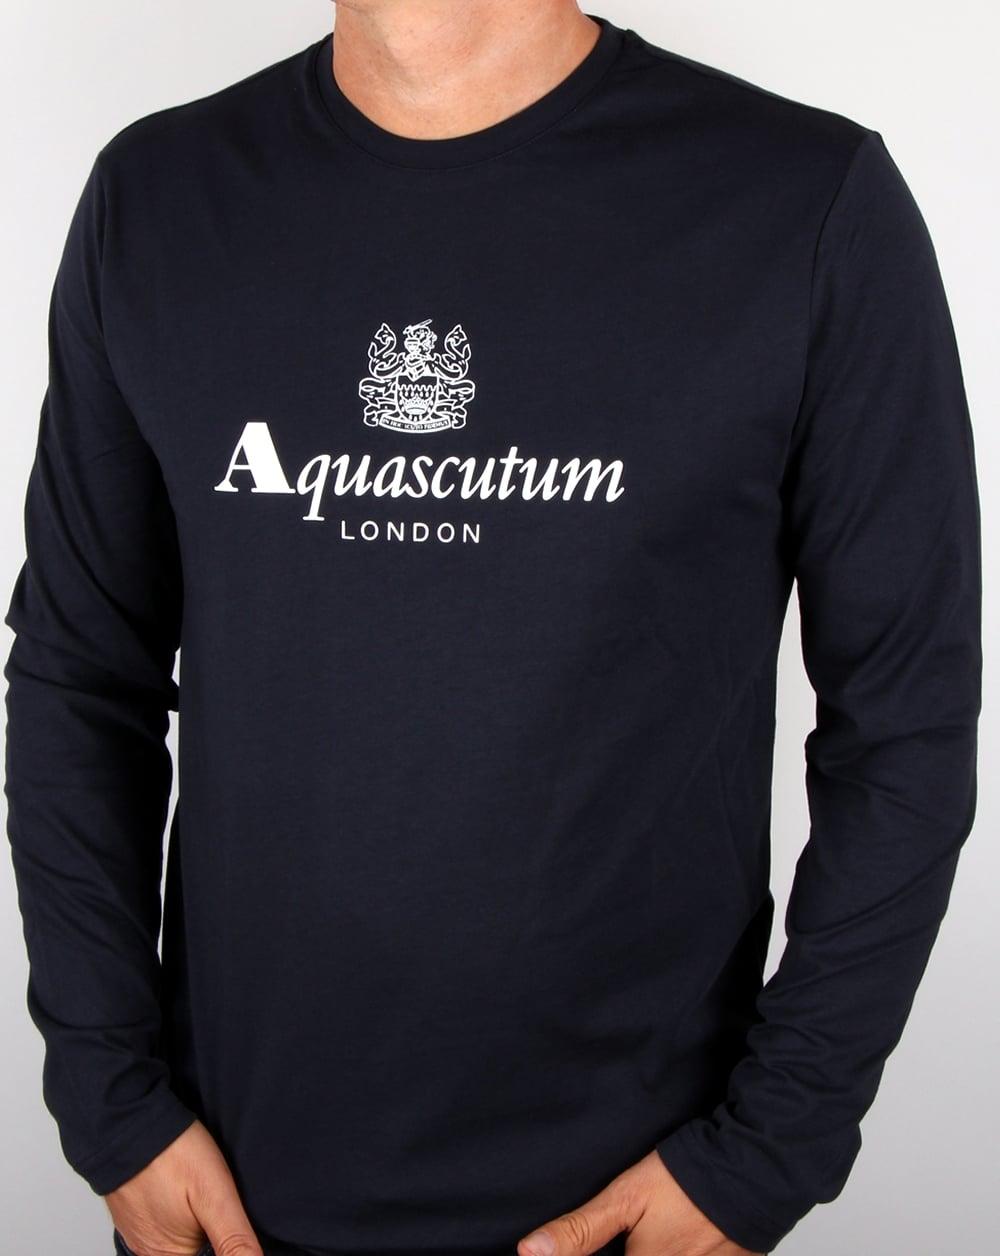 Aquascutum long sleeve t shirt navy branded tee mens for A long sleeve shirt